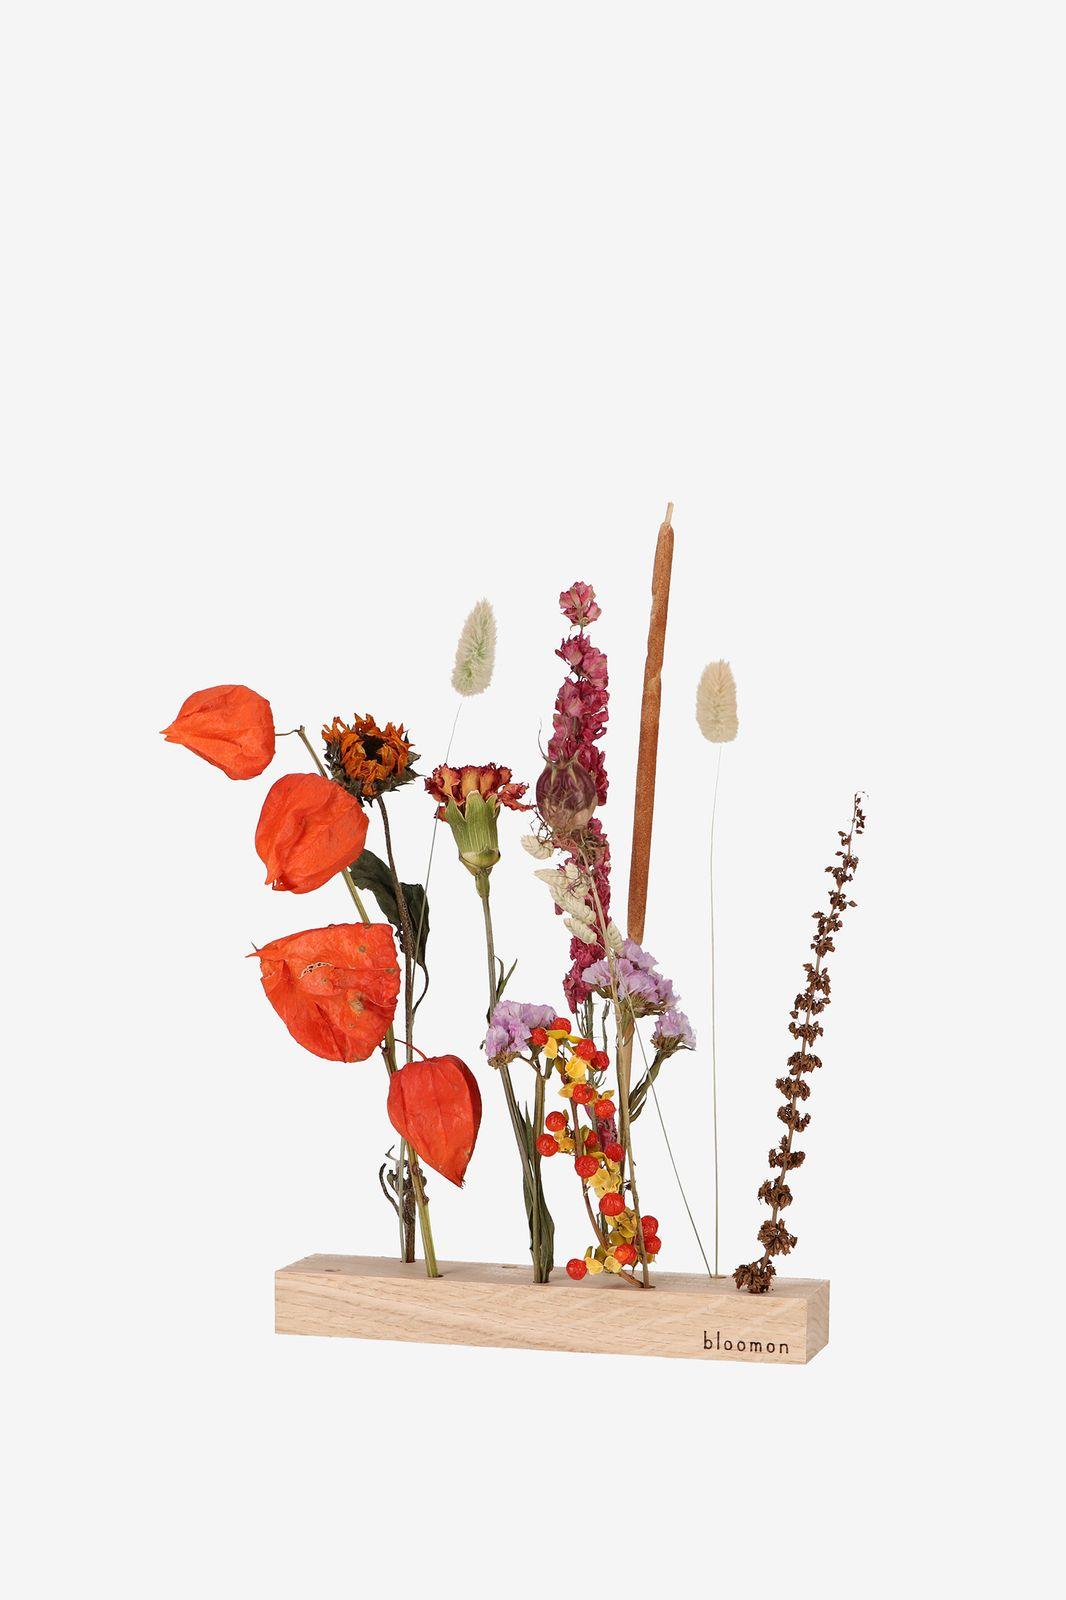 Bloomon flowergram fabulous fall - Homeland | Sissy-Boy